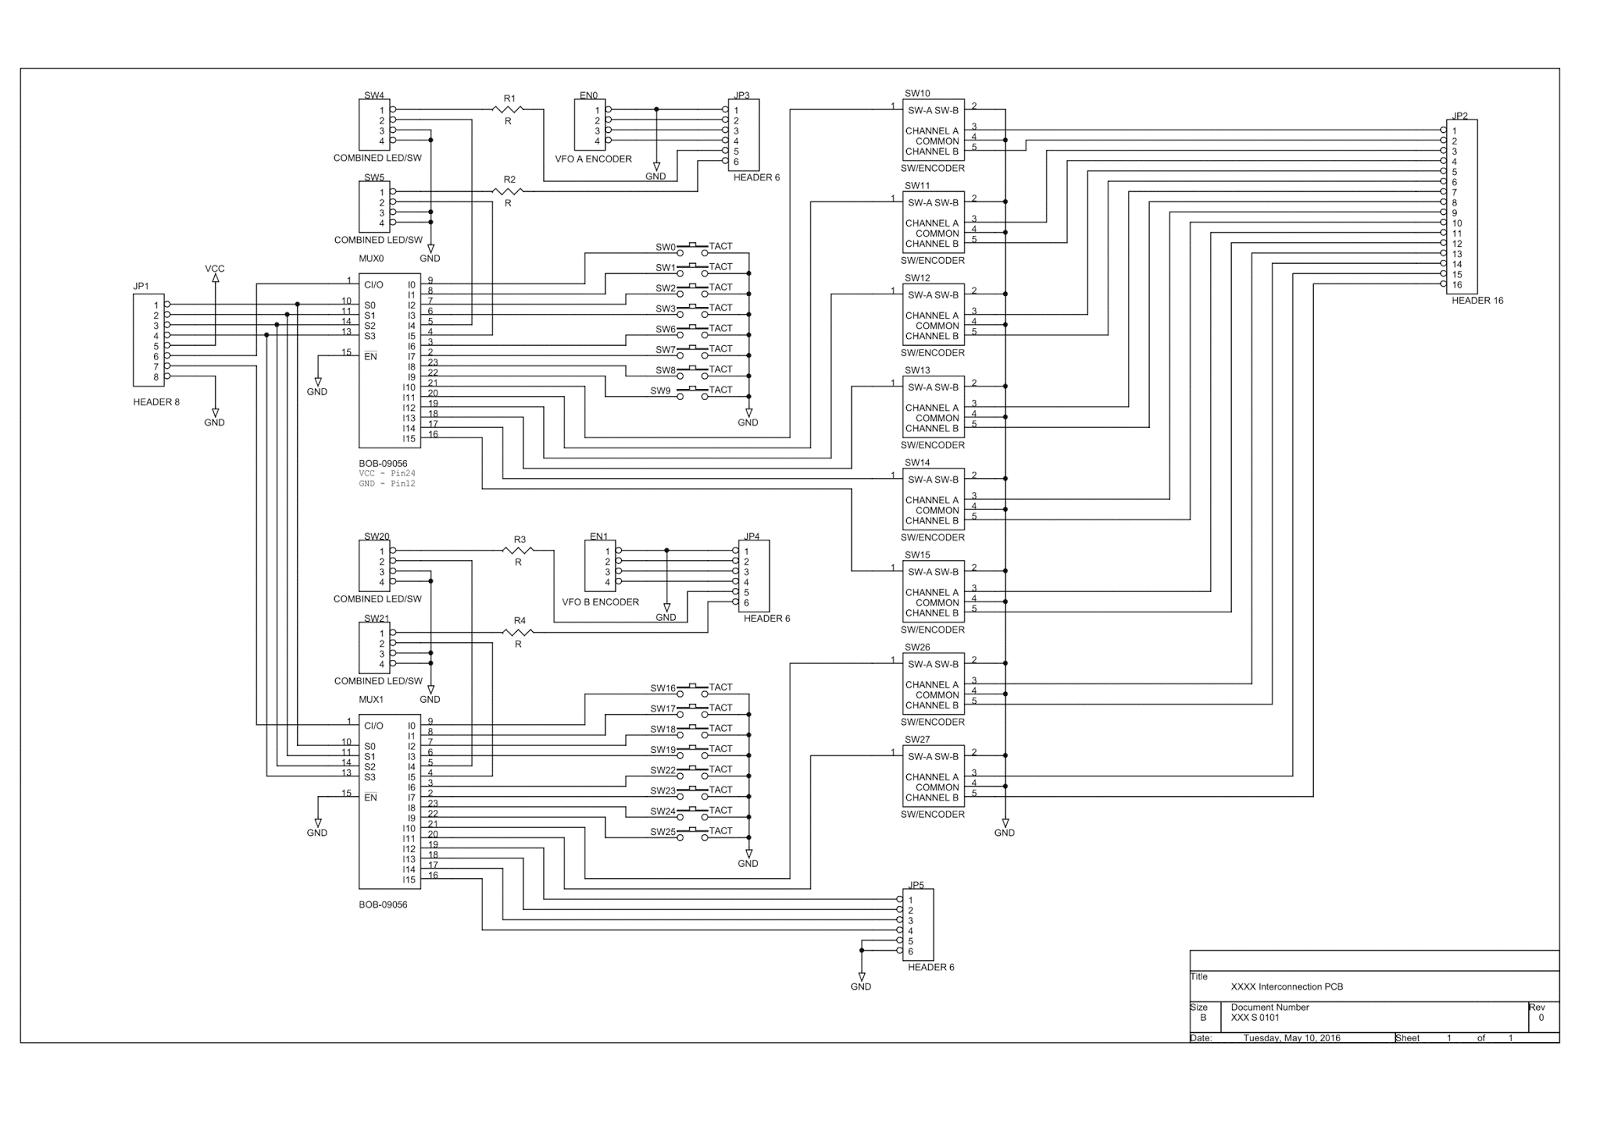 G3wgv S Flex Radio Controller May